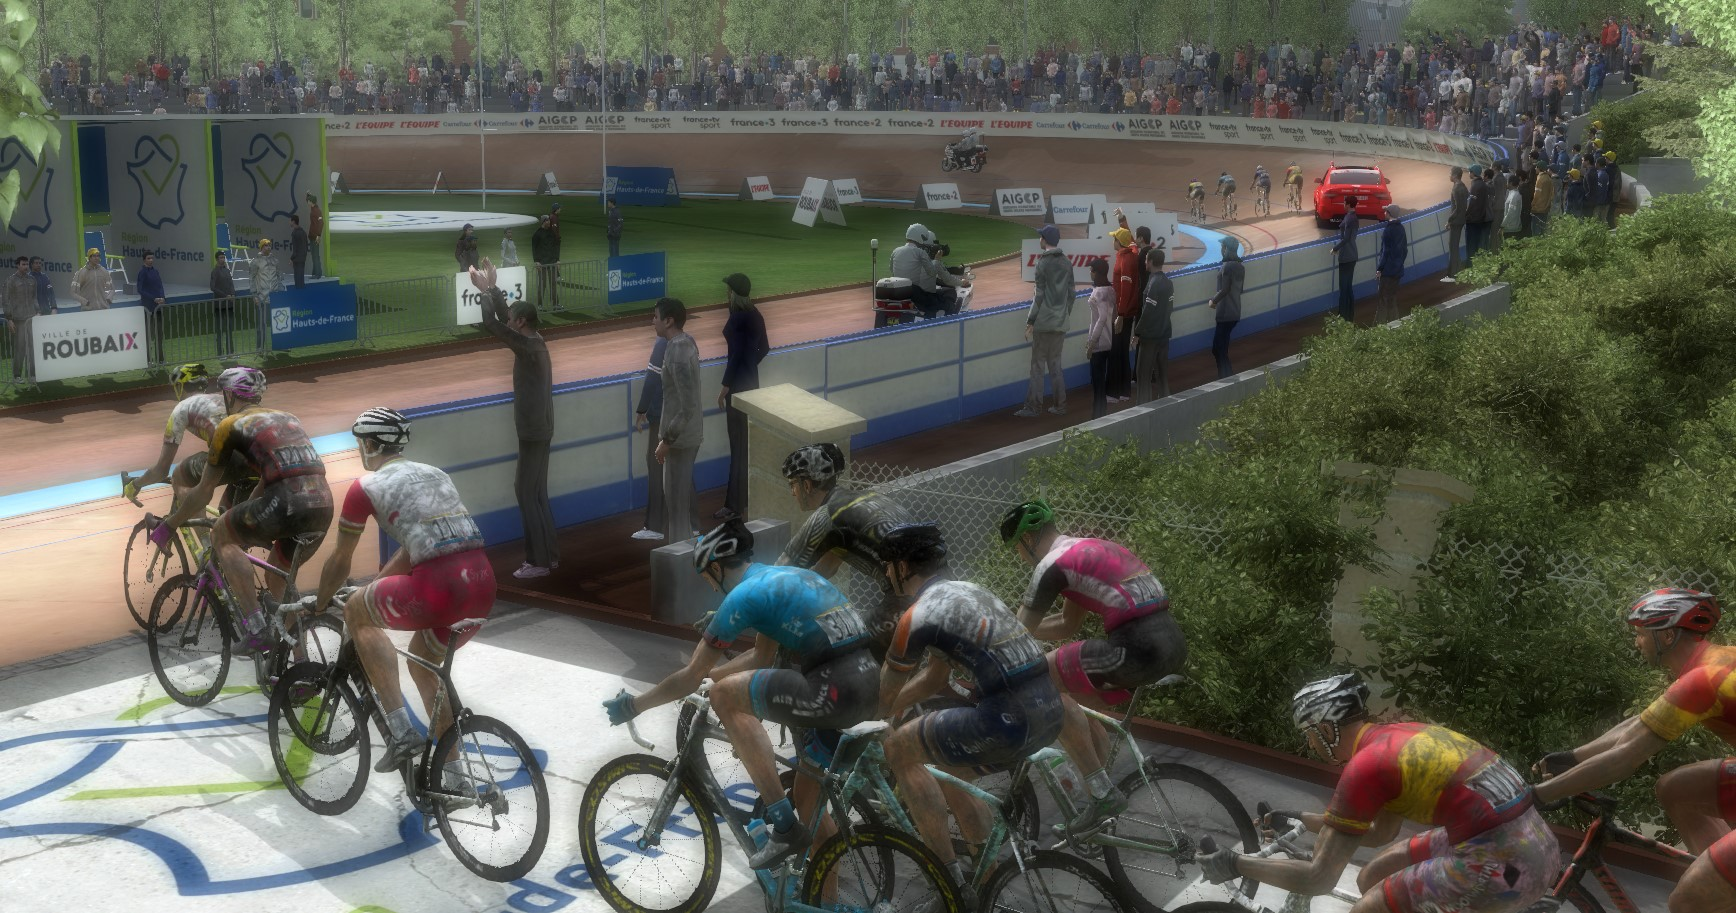 pcmdaily.com/images/mg/2019/Races/GTM/PR/37.jpg